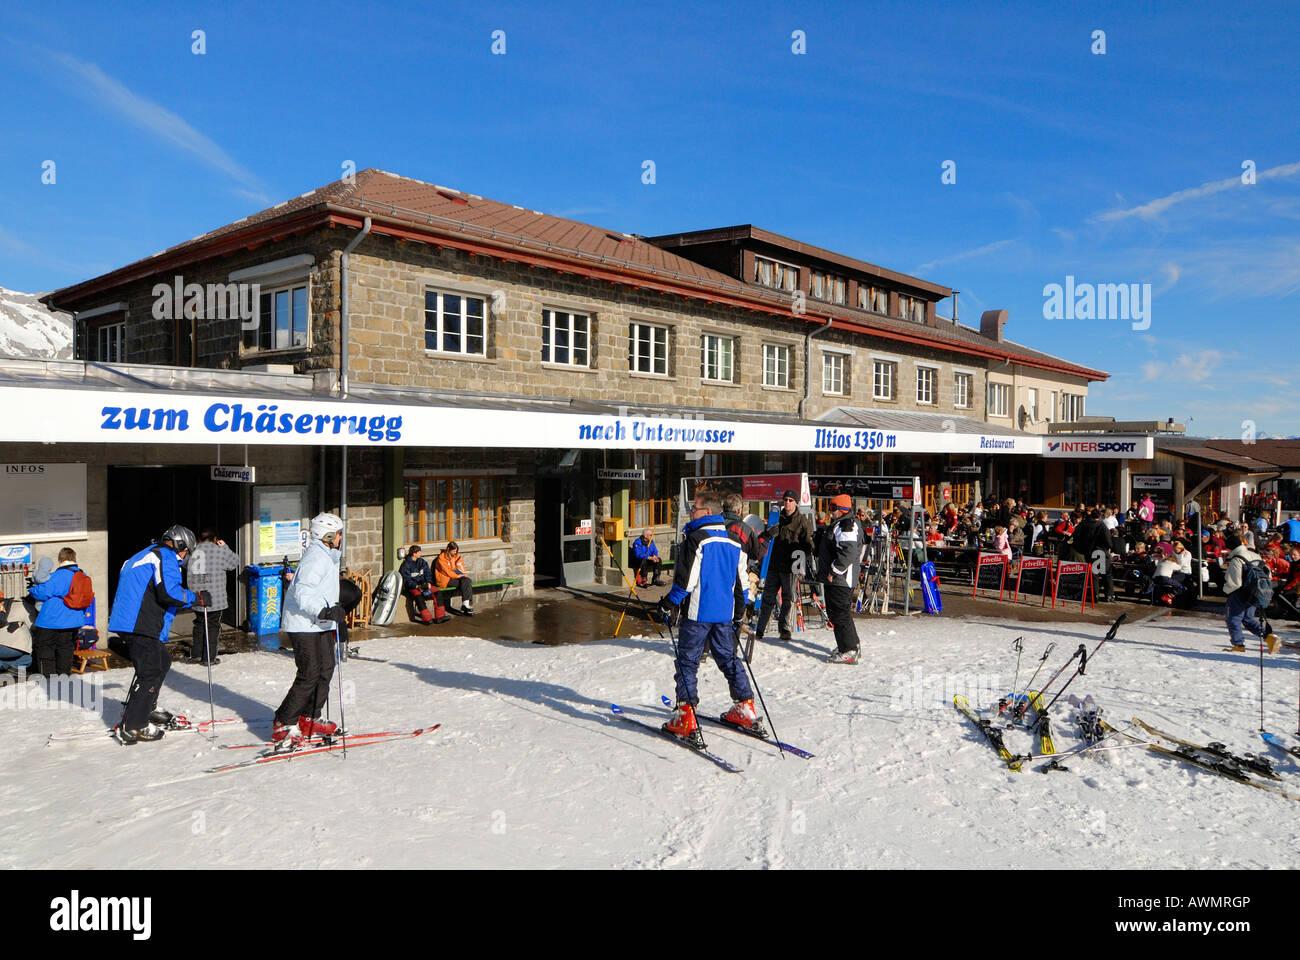 Restaurante en la montaña - Unterwasser Iltios, Cantón de San Gallen, Suiza, Europa. Foto de stock